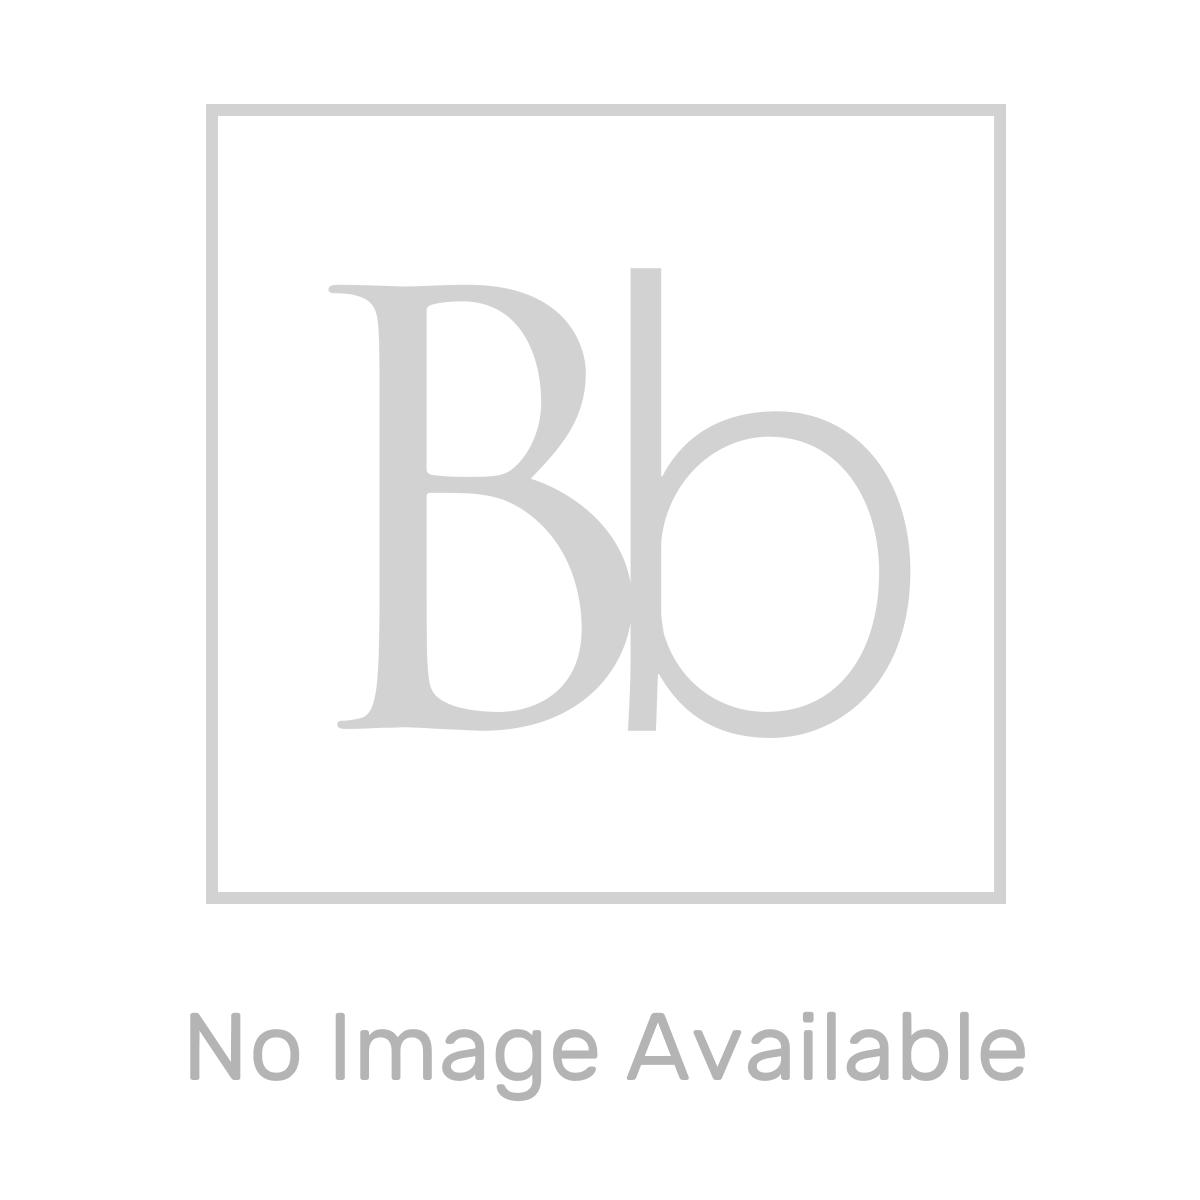 RAK Washington Cappucino Freestanding Bath 1560mm Measurements